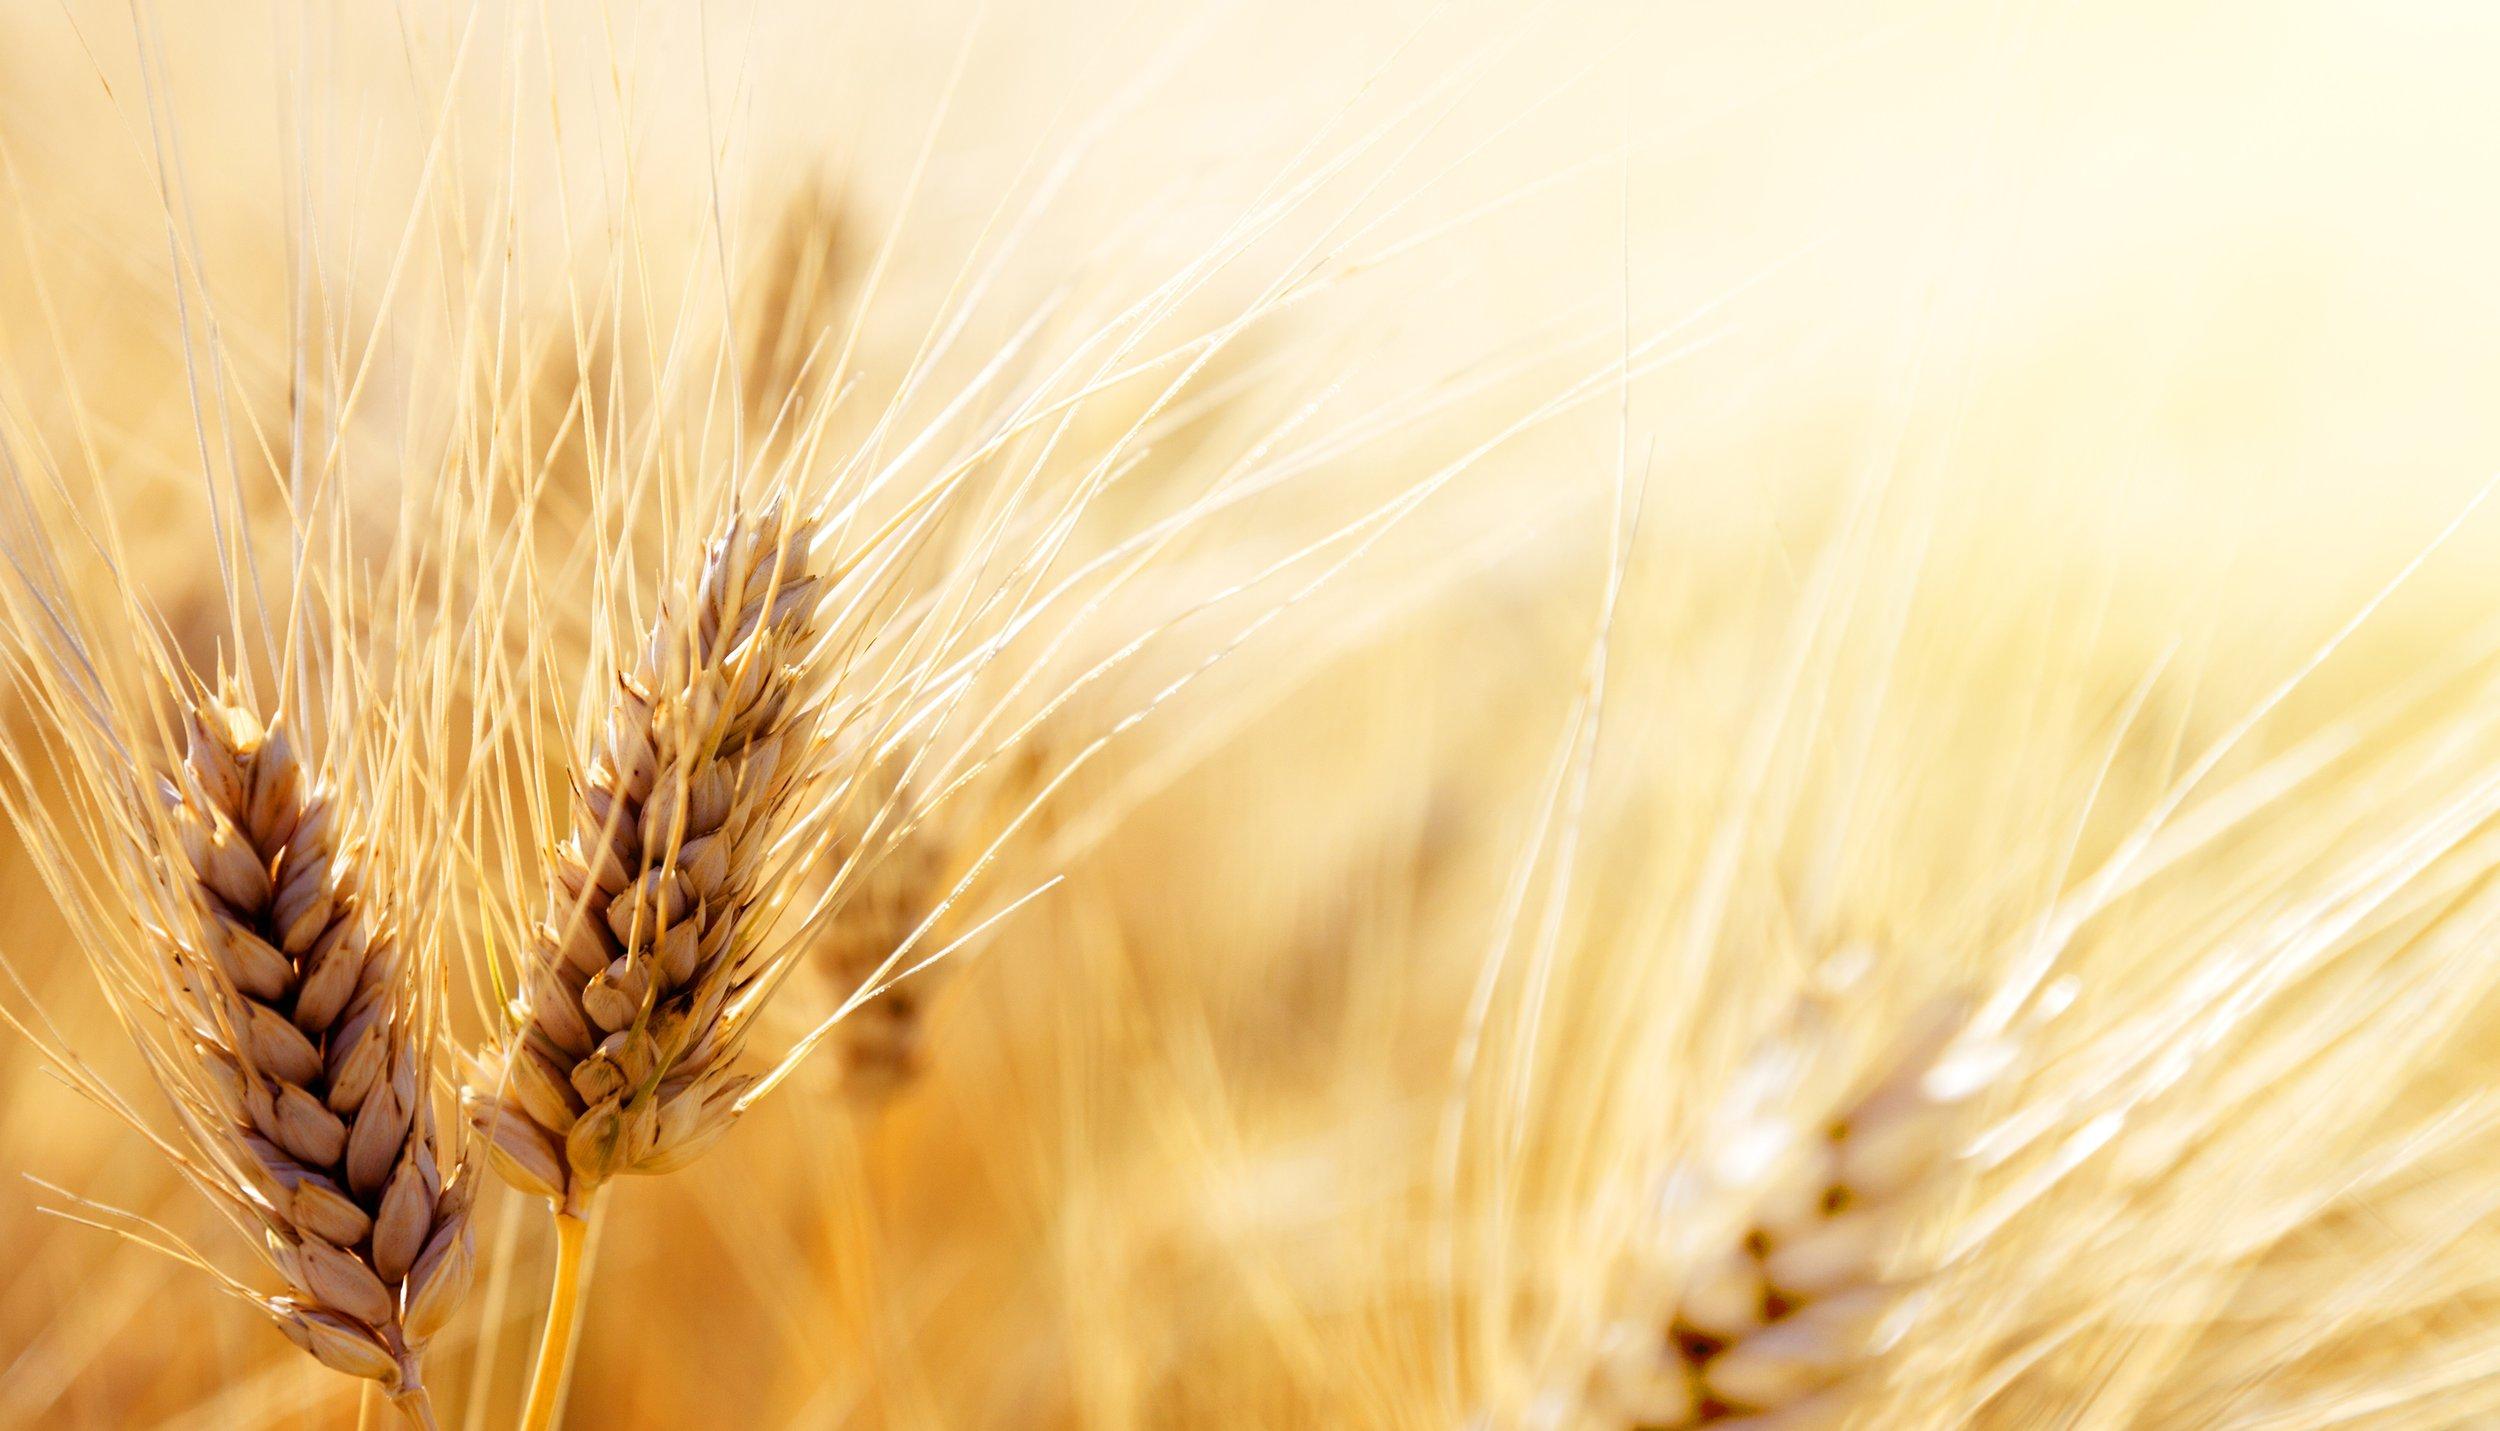 wheat-food-grain-grass-family-cereal-grain-rye-1425791-pxhere.com.jpg